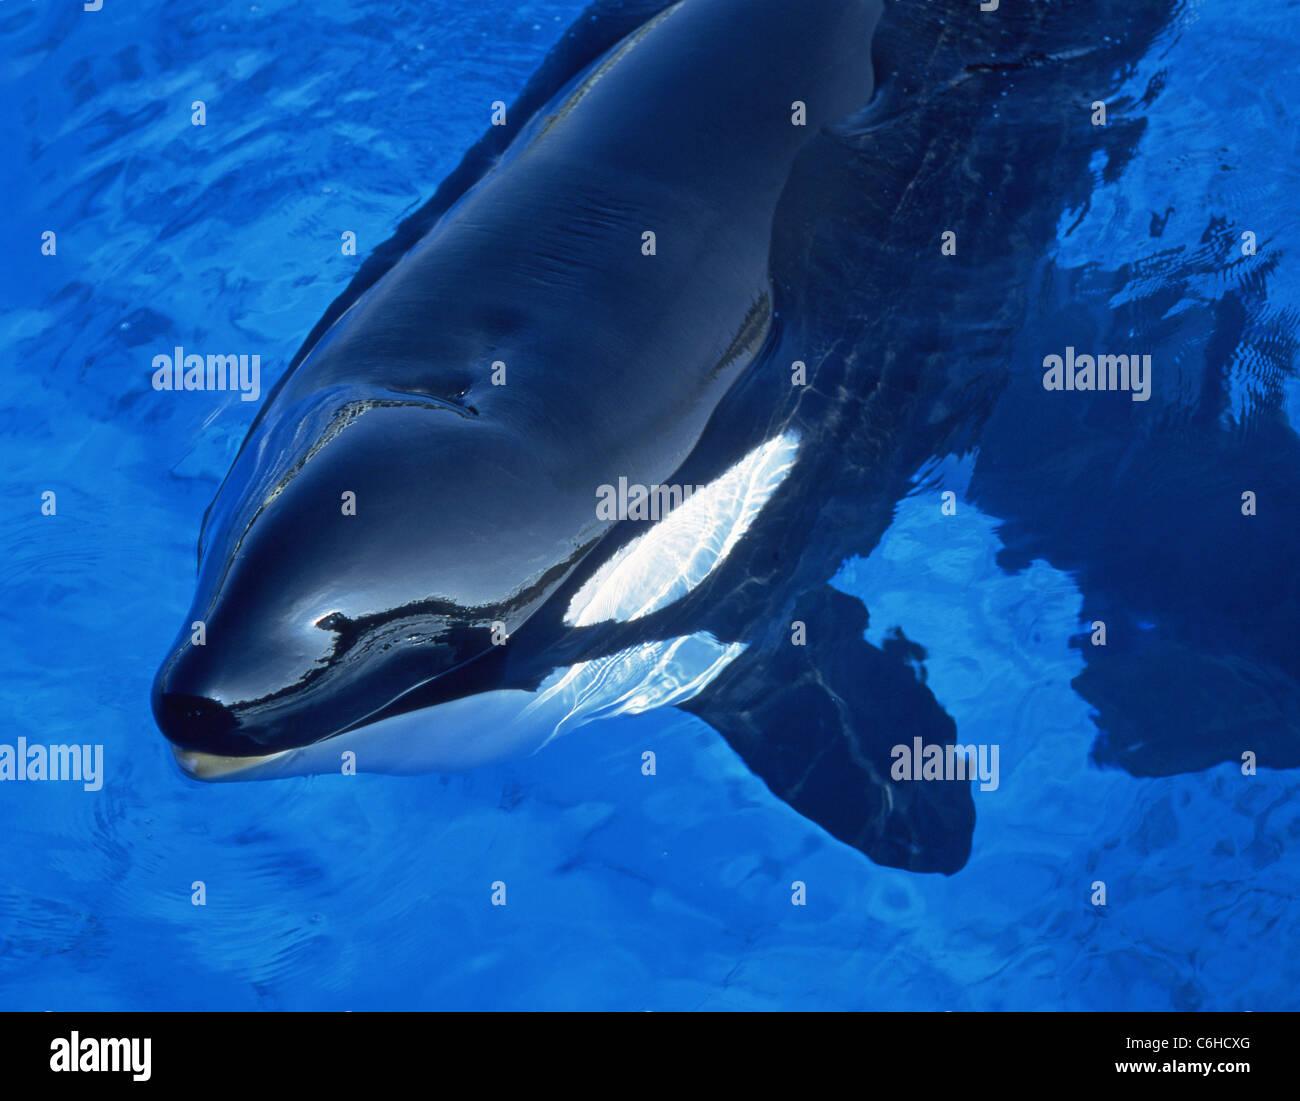 Orca Whale in pool, Sea World, Orlando, Florida, United States of America - Stock Image